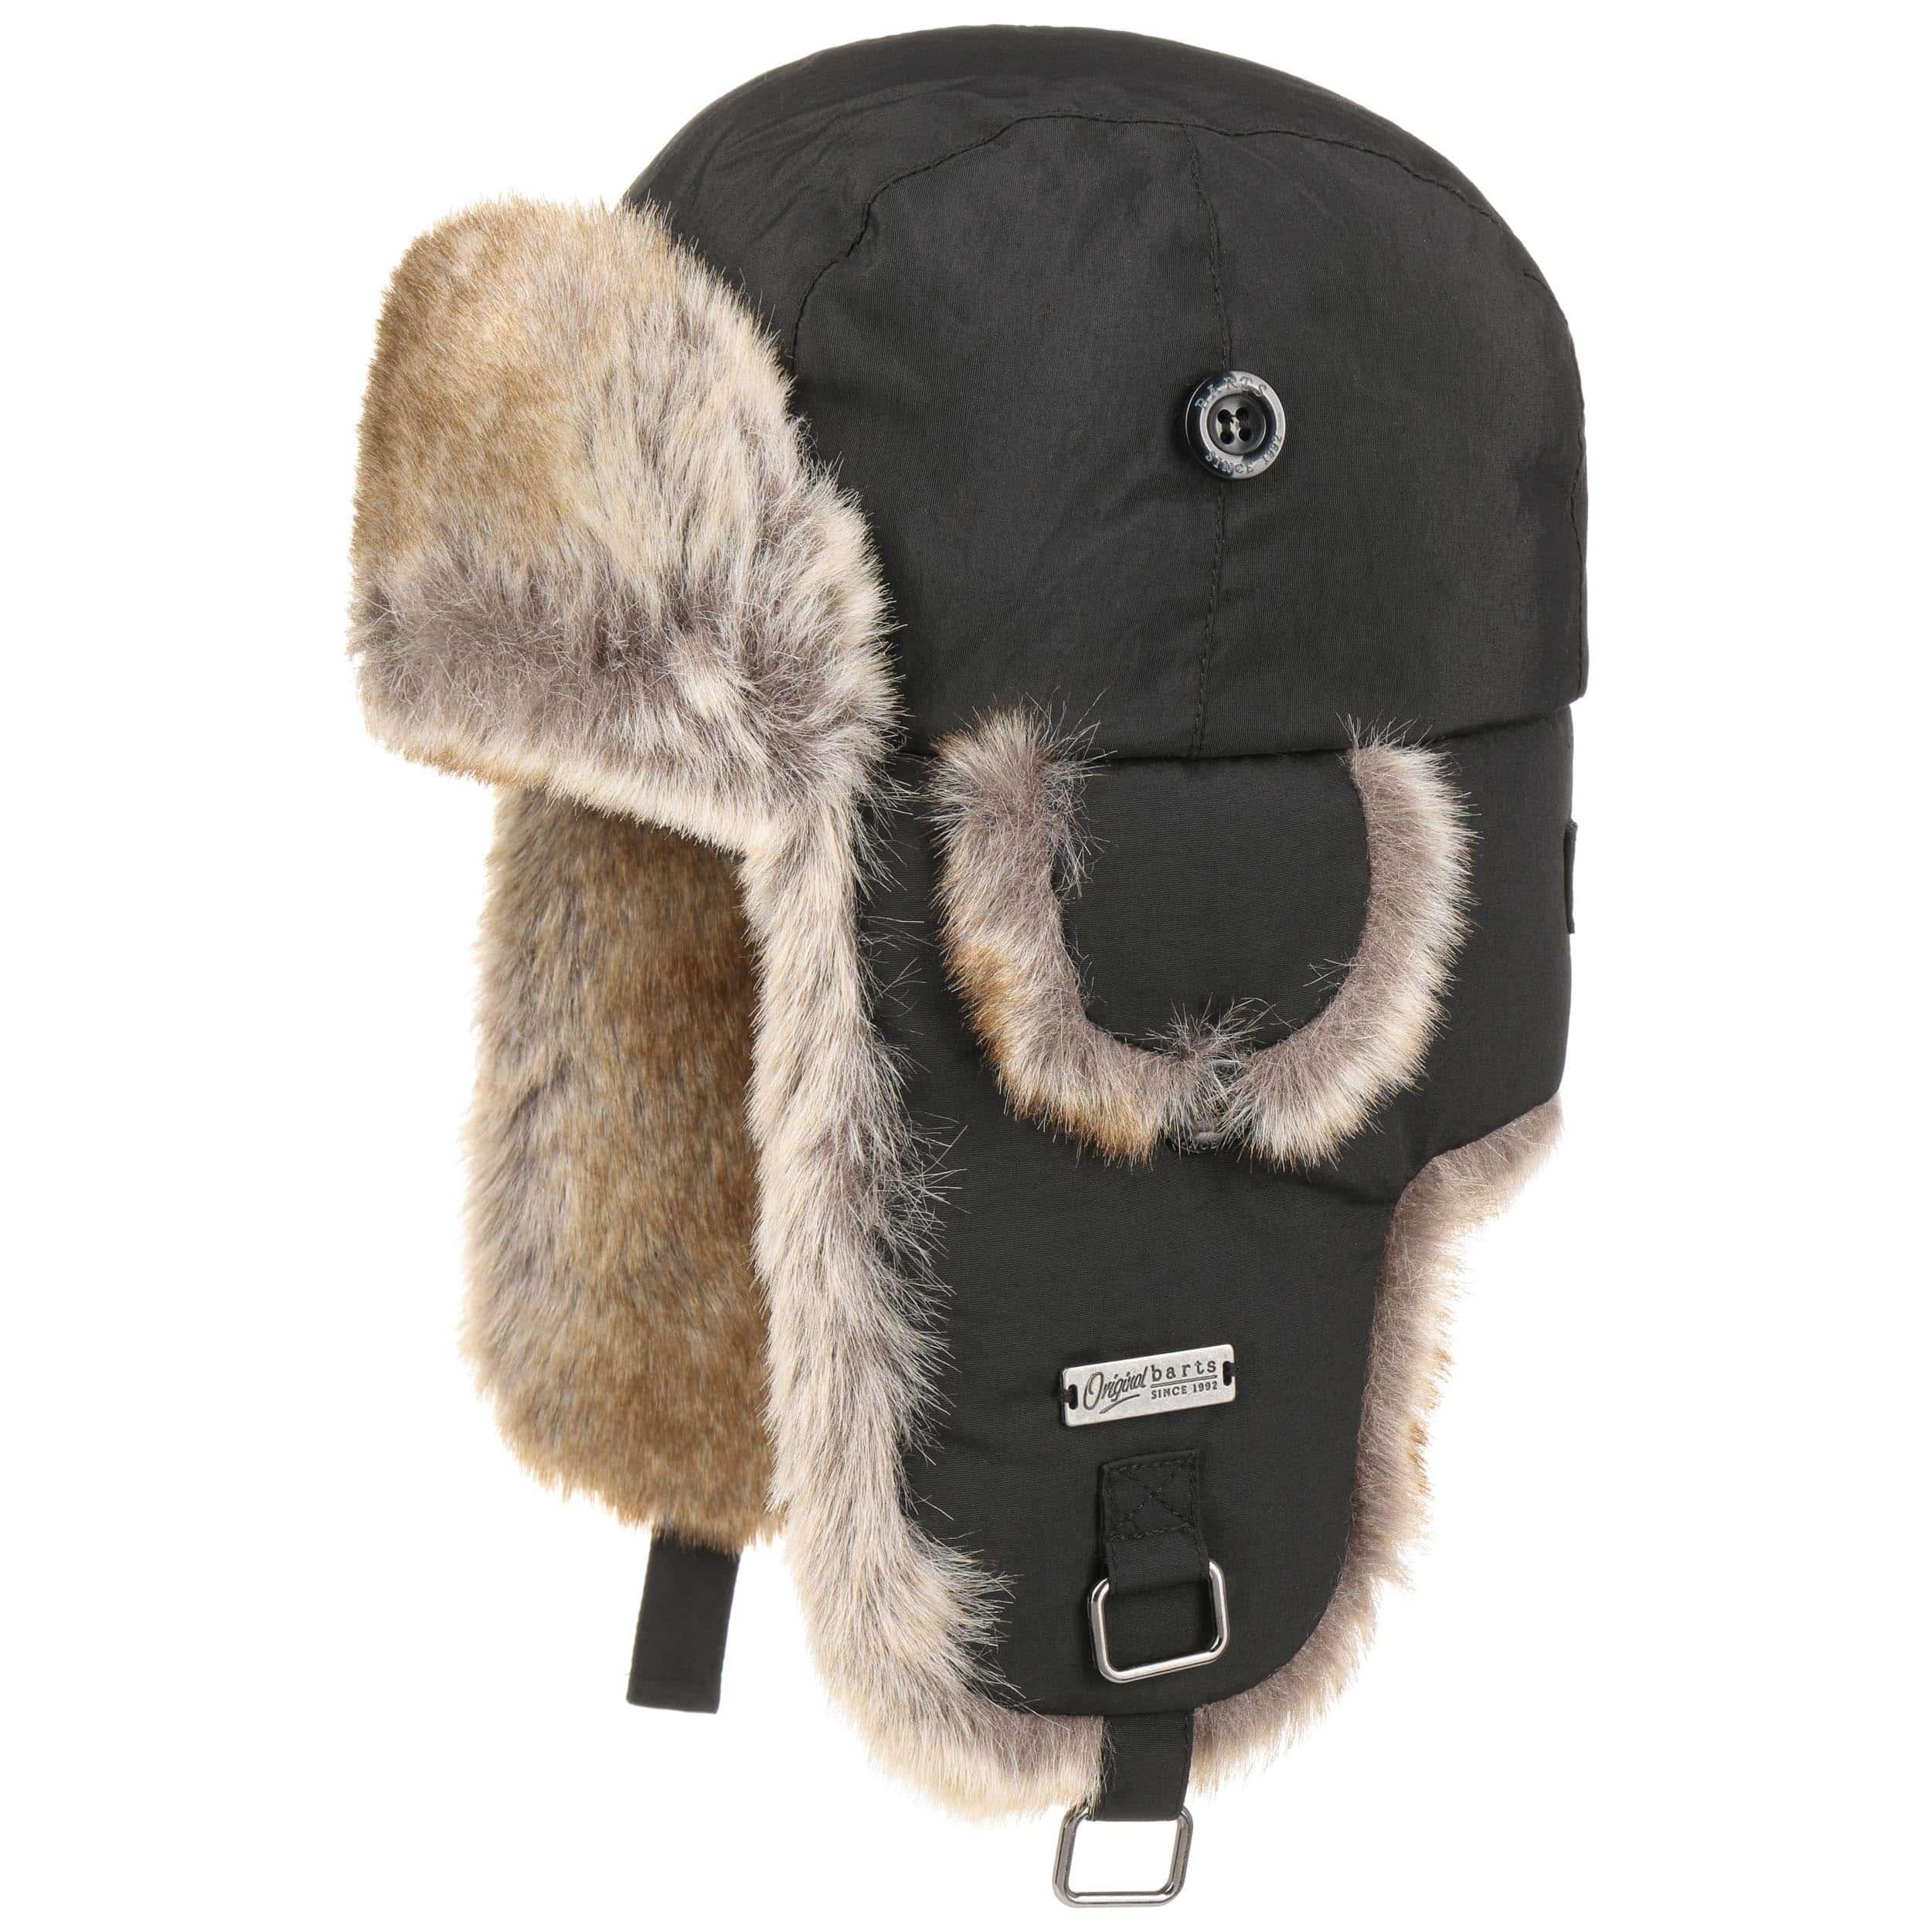 ... Checked Kamikaze Kids Aviator Hat by Barts - black 9 85cd829893f8